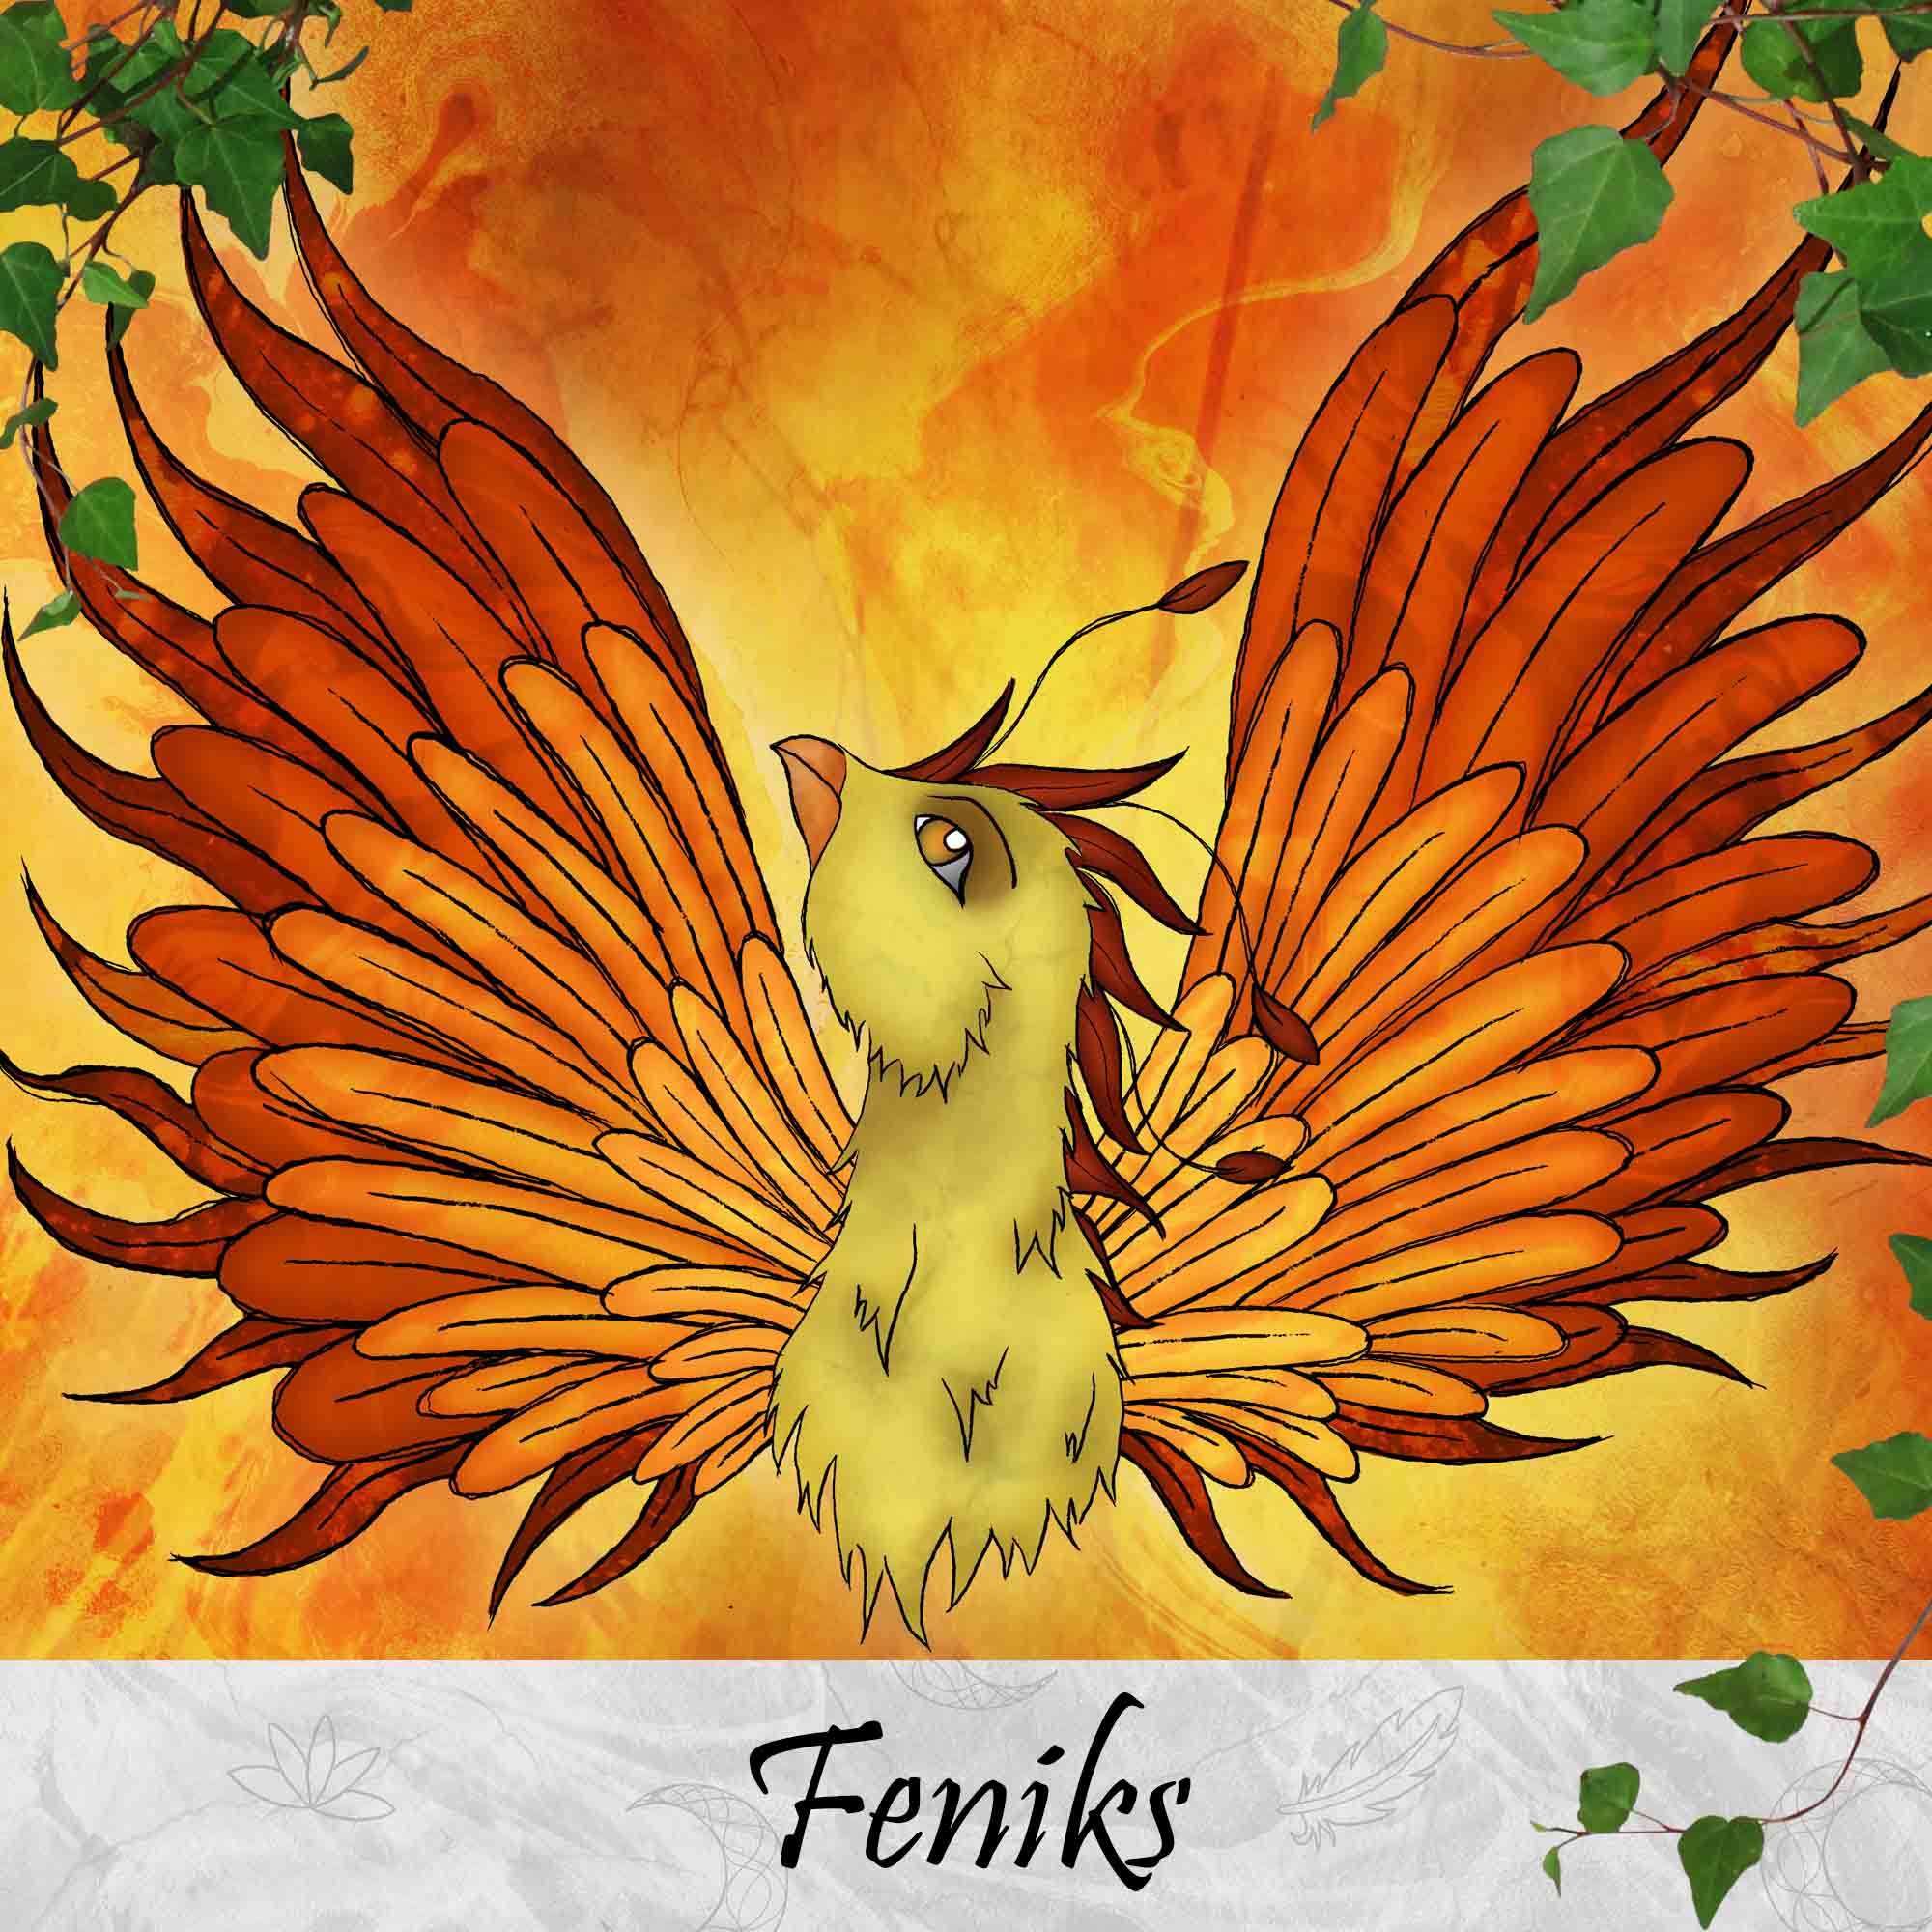 Feniks-Phoenix-Mythologische Wezens-Thema-Producten-SBDesignsCreations